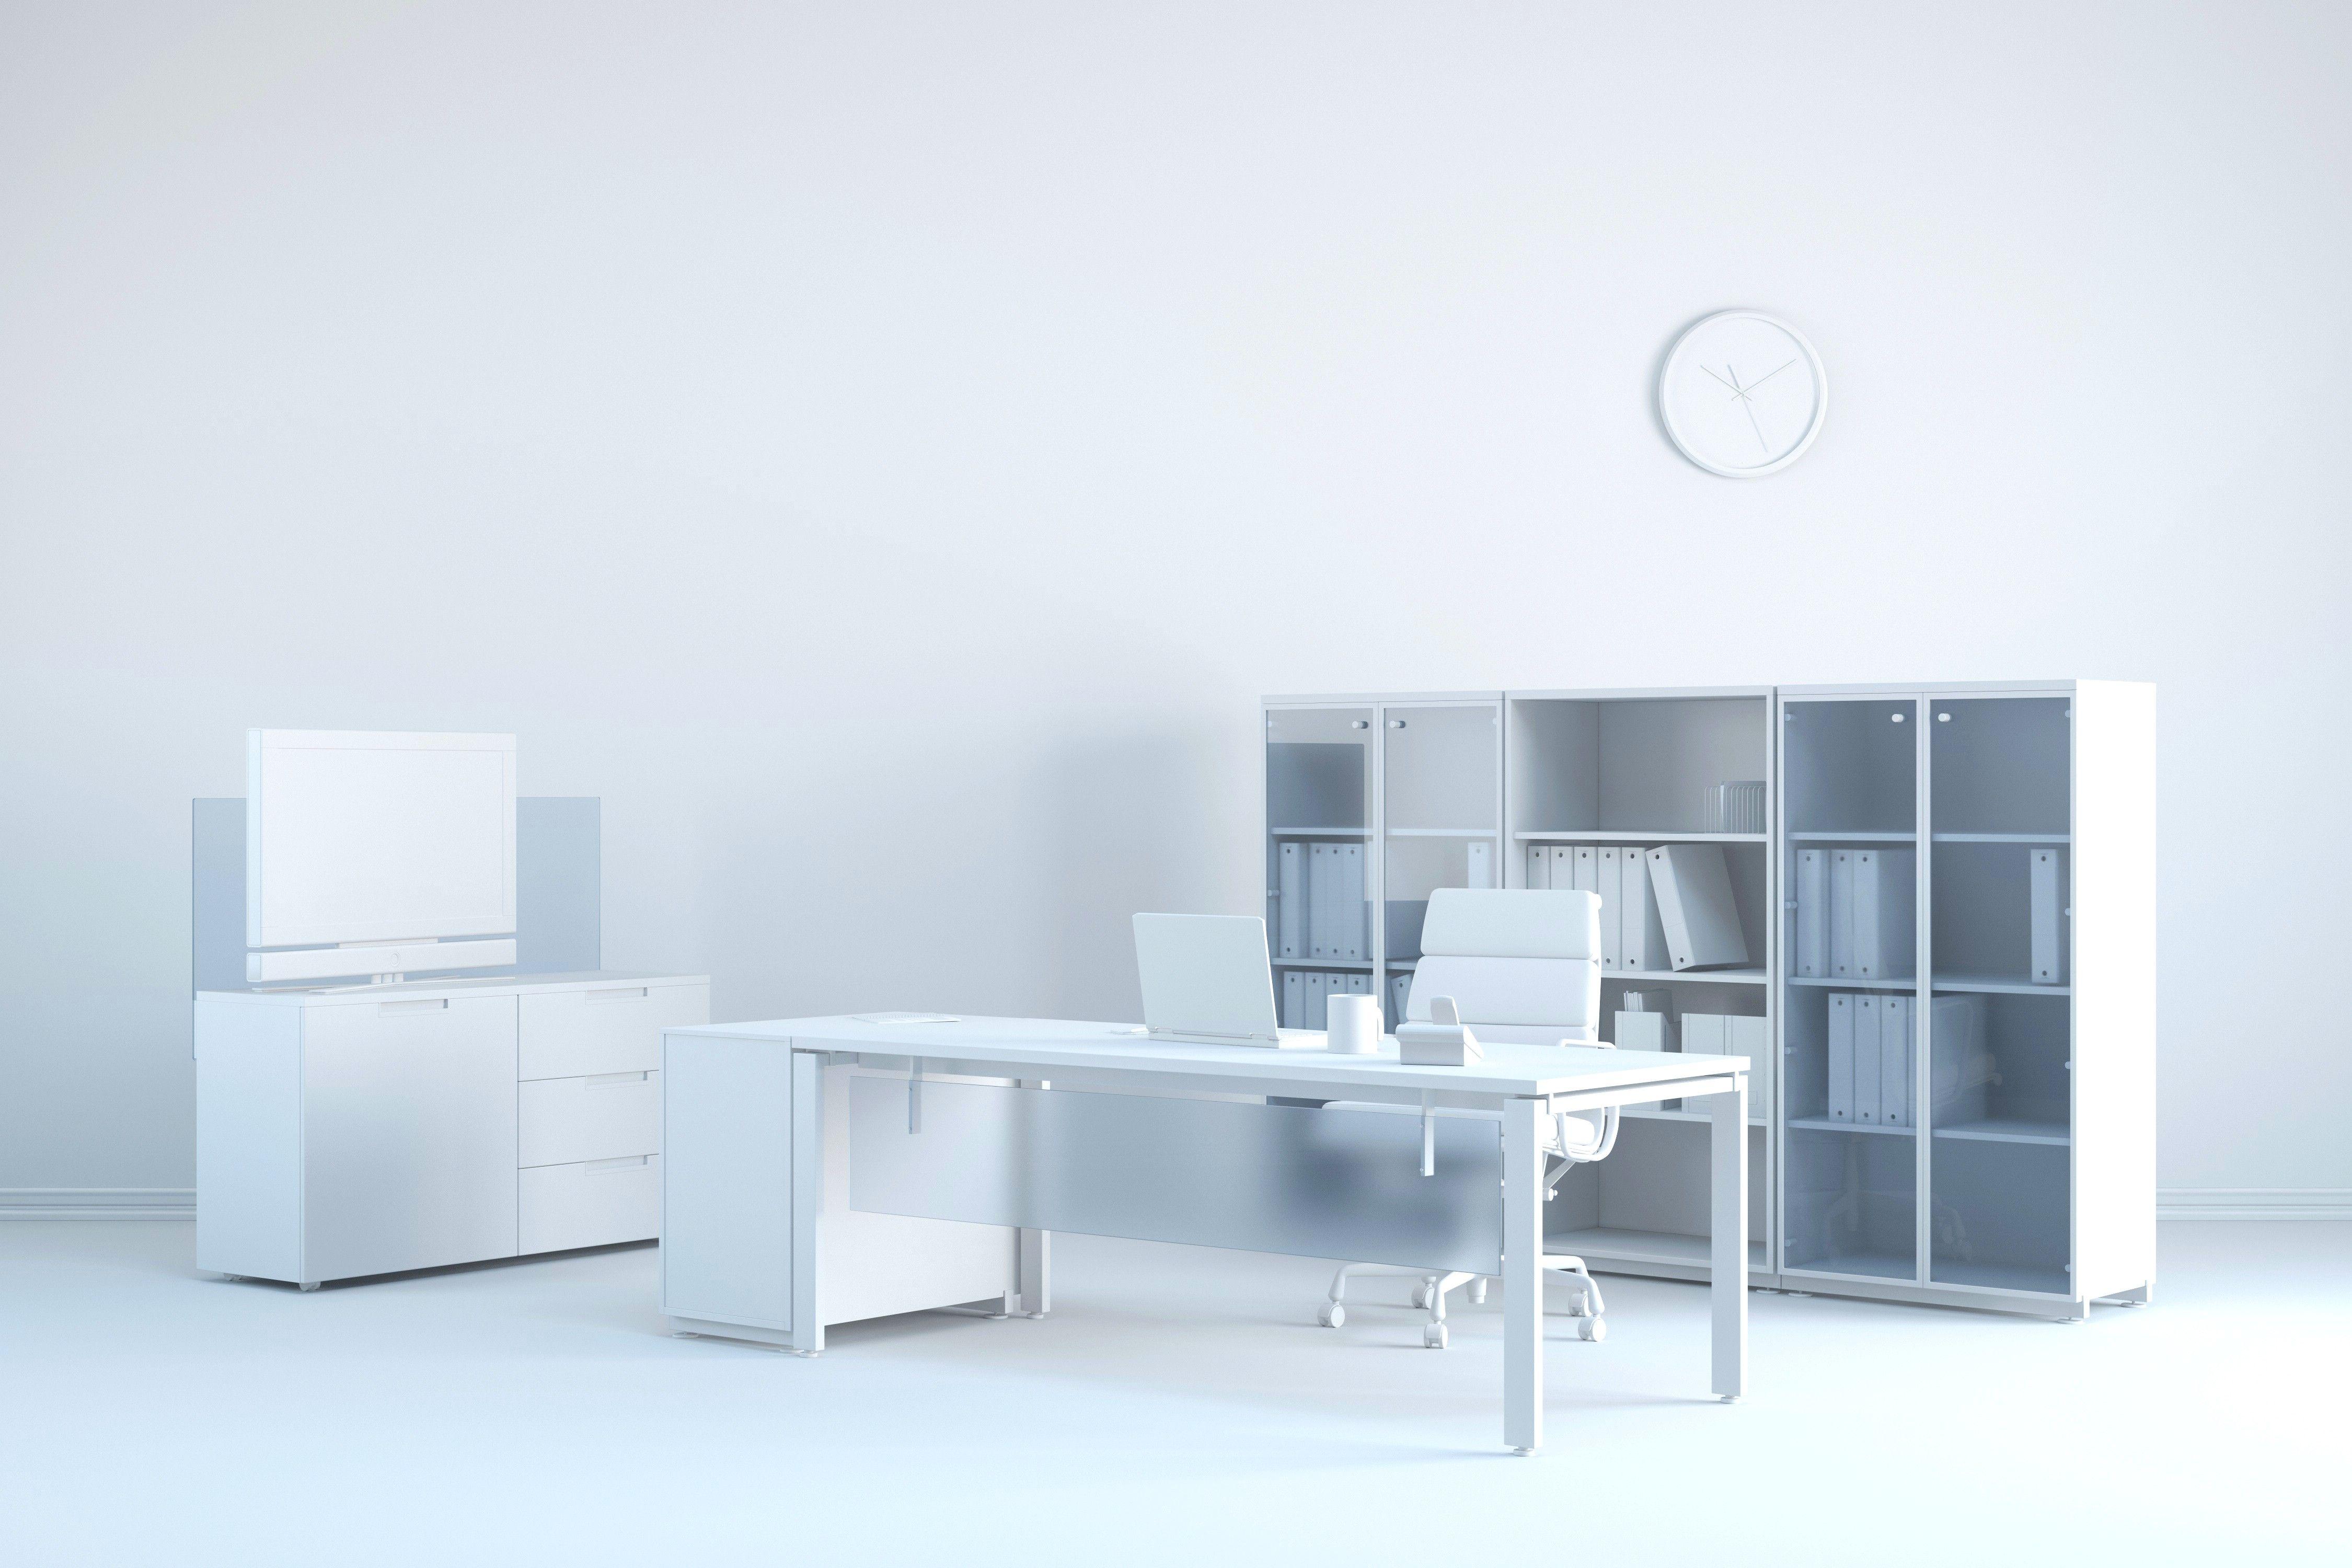 Armoire De Bureau Occasion Wohn Design Wohnen Design